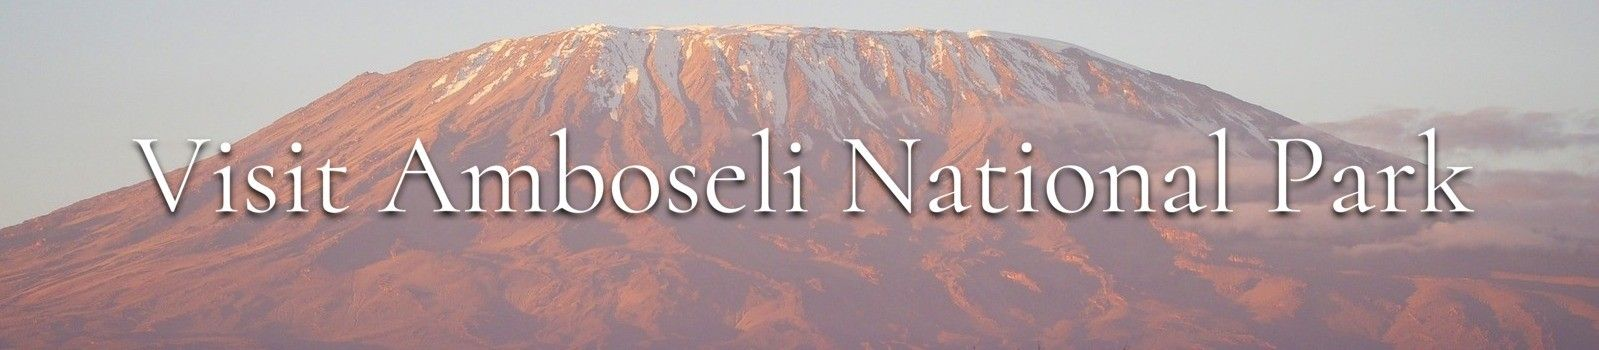 Visit Amboseli National Park banner